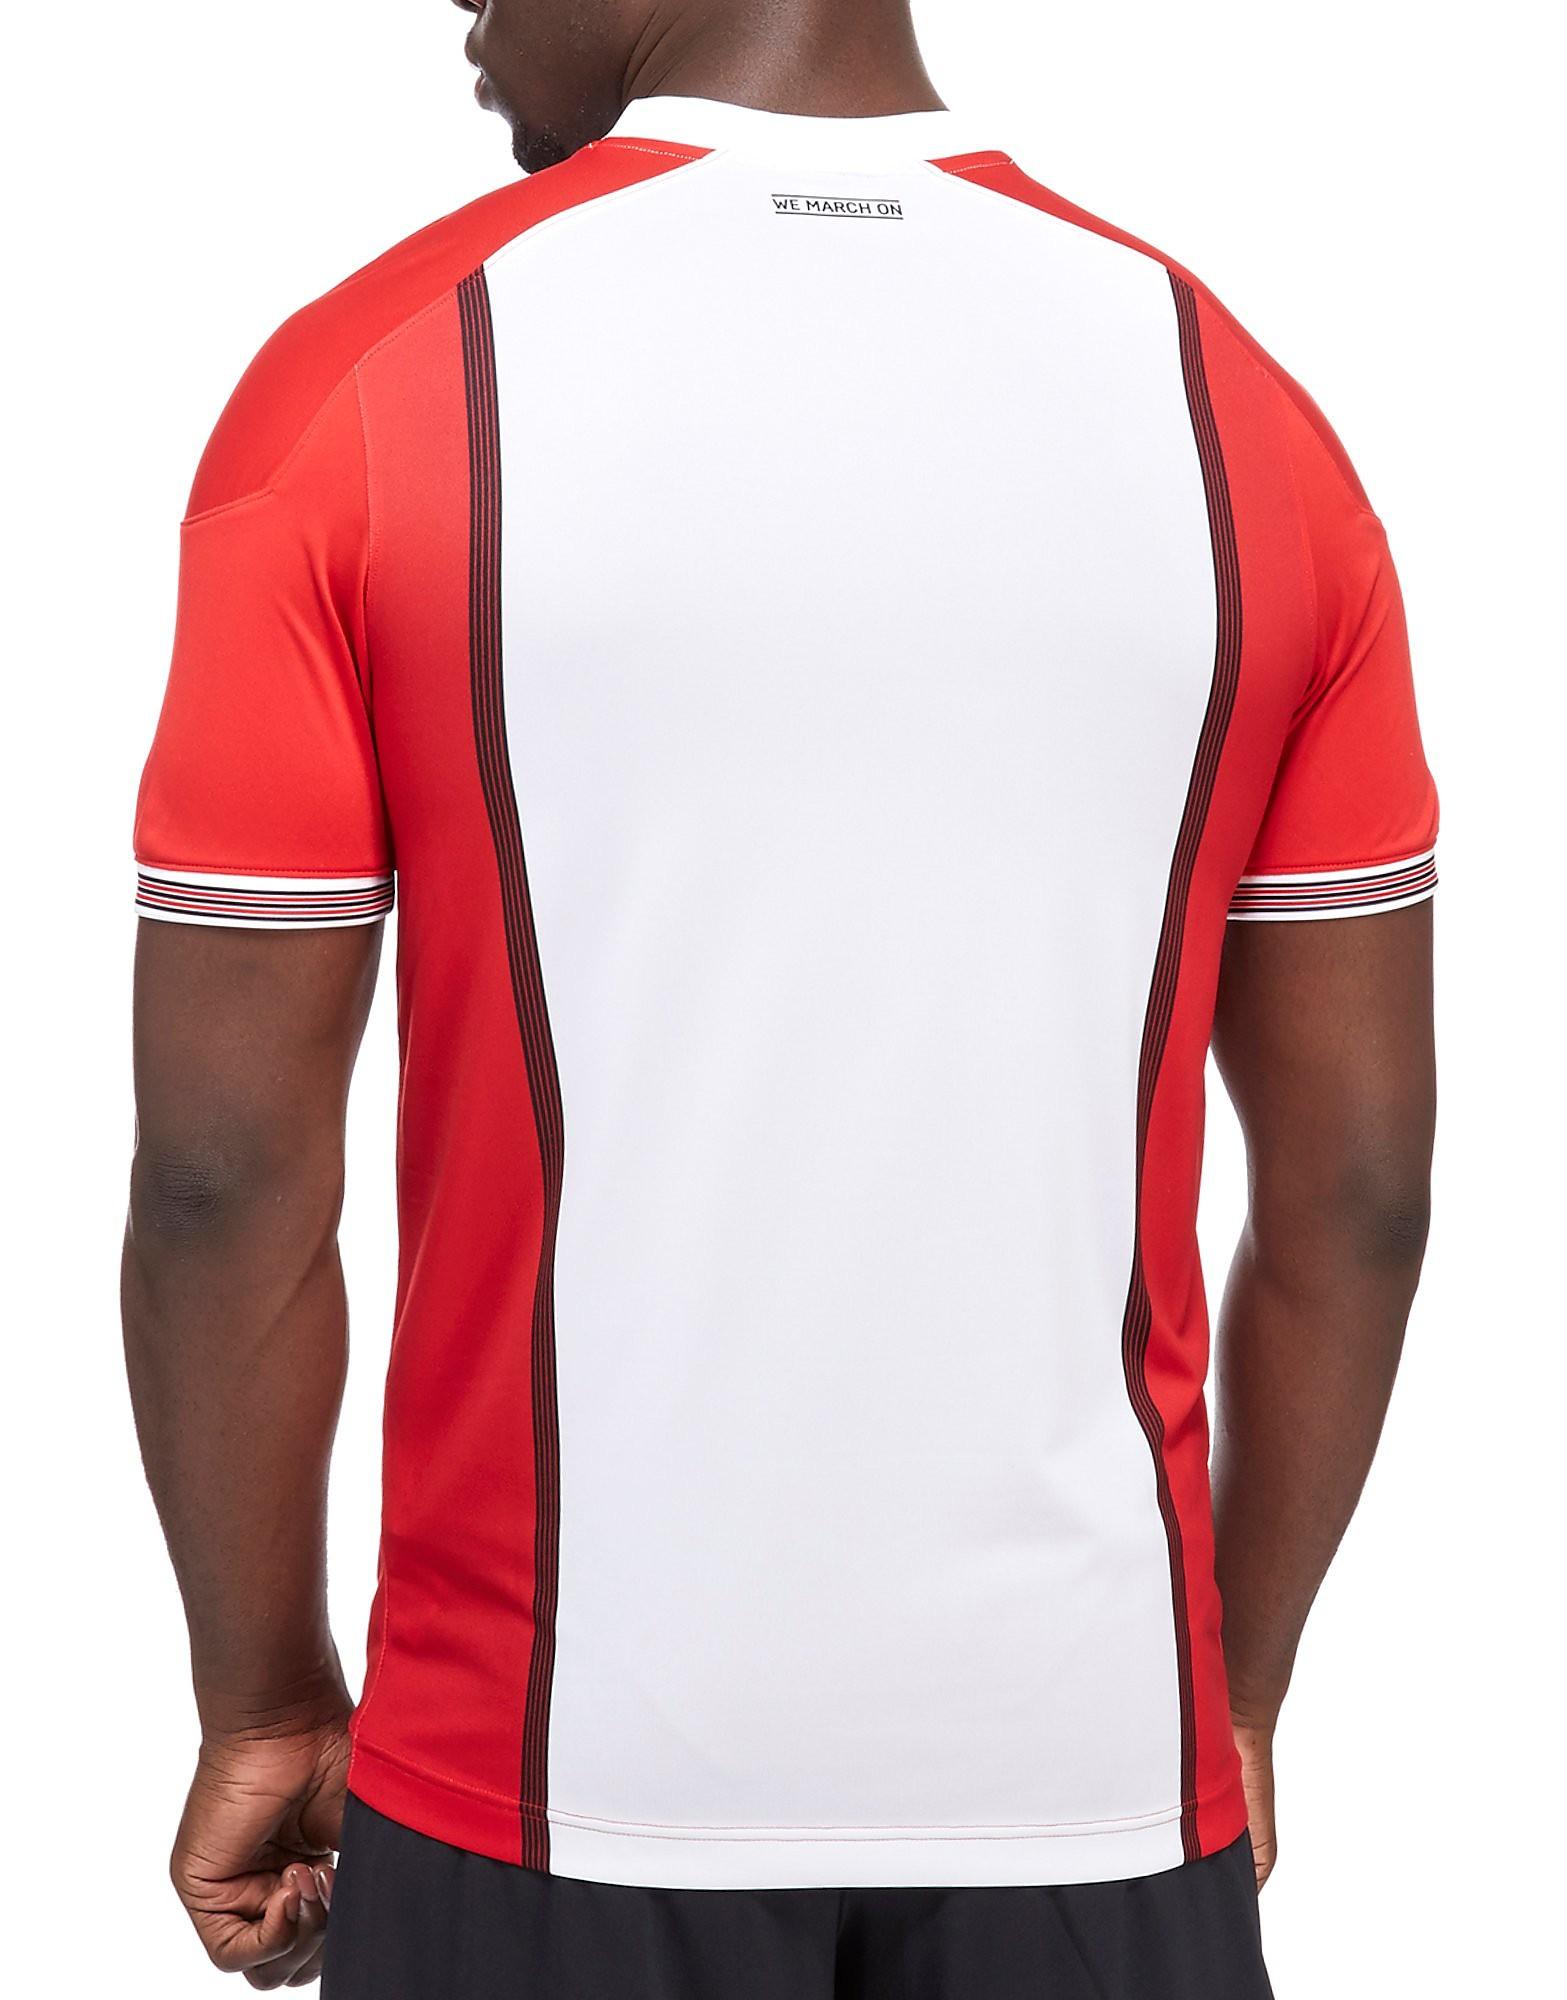 Under Armour Southampton FC 2017/18 Home Shirt